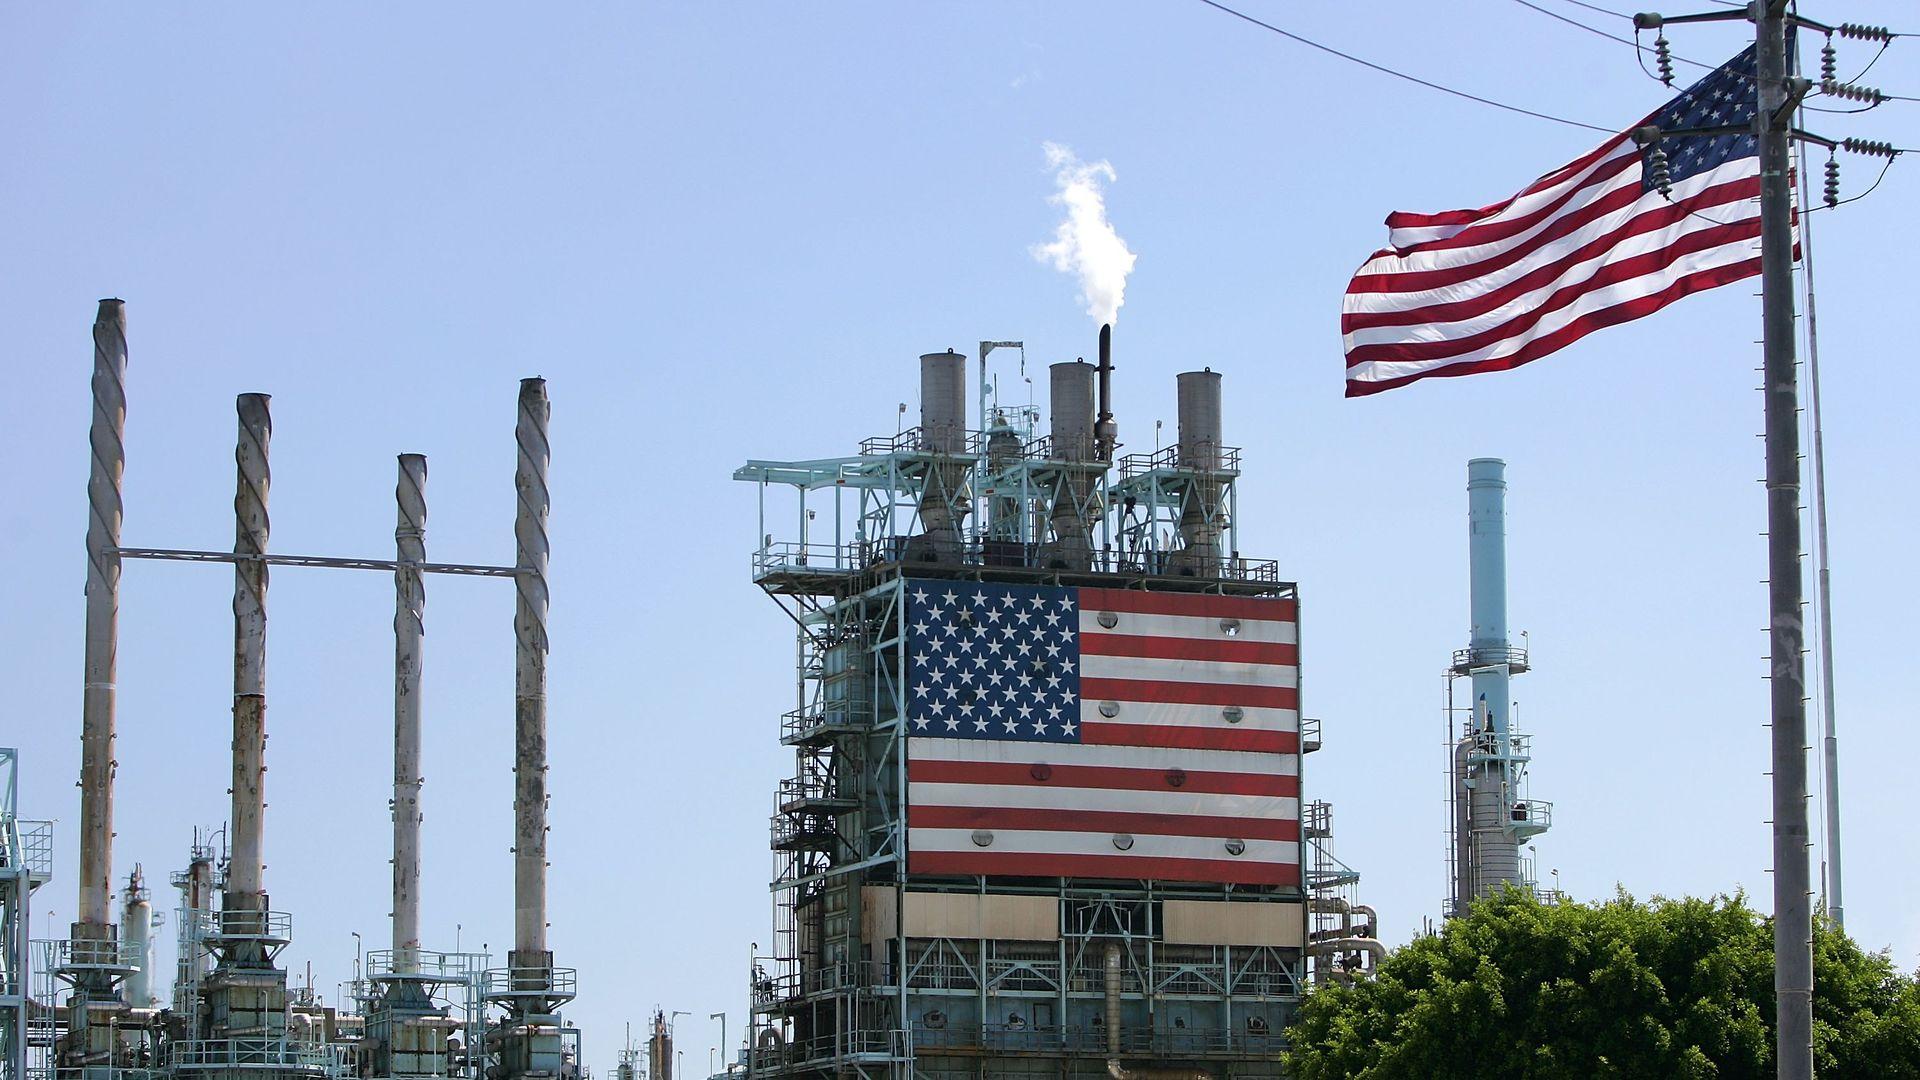 A BP oil refinery in California.